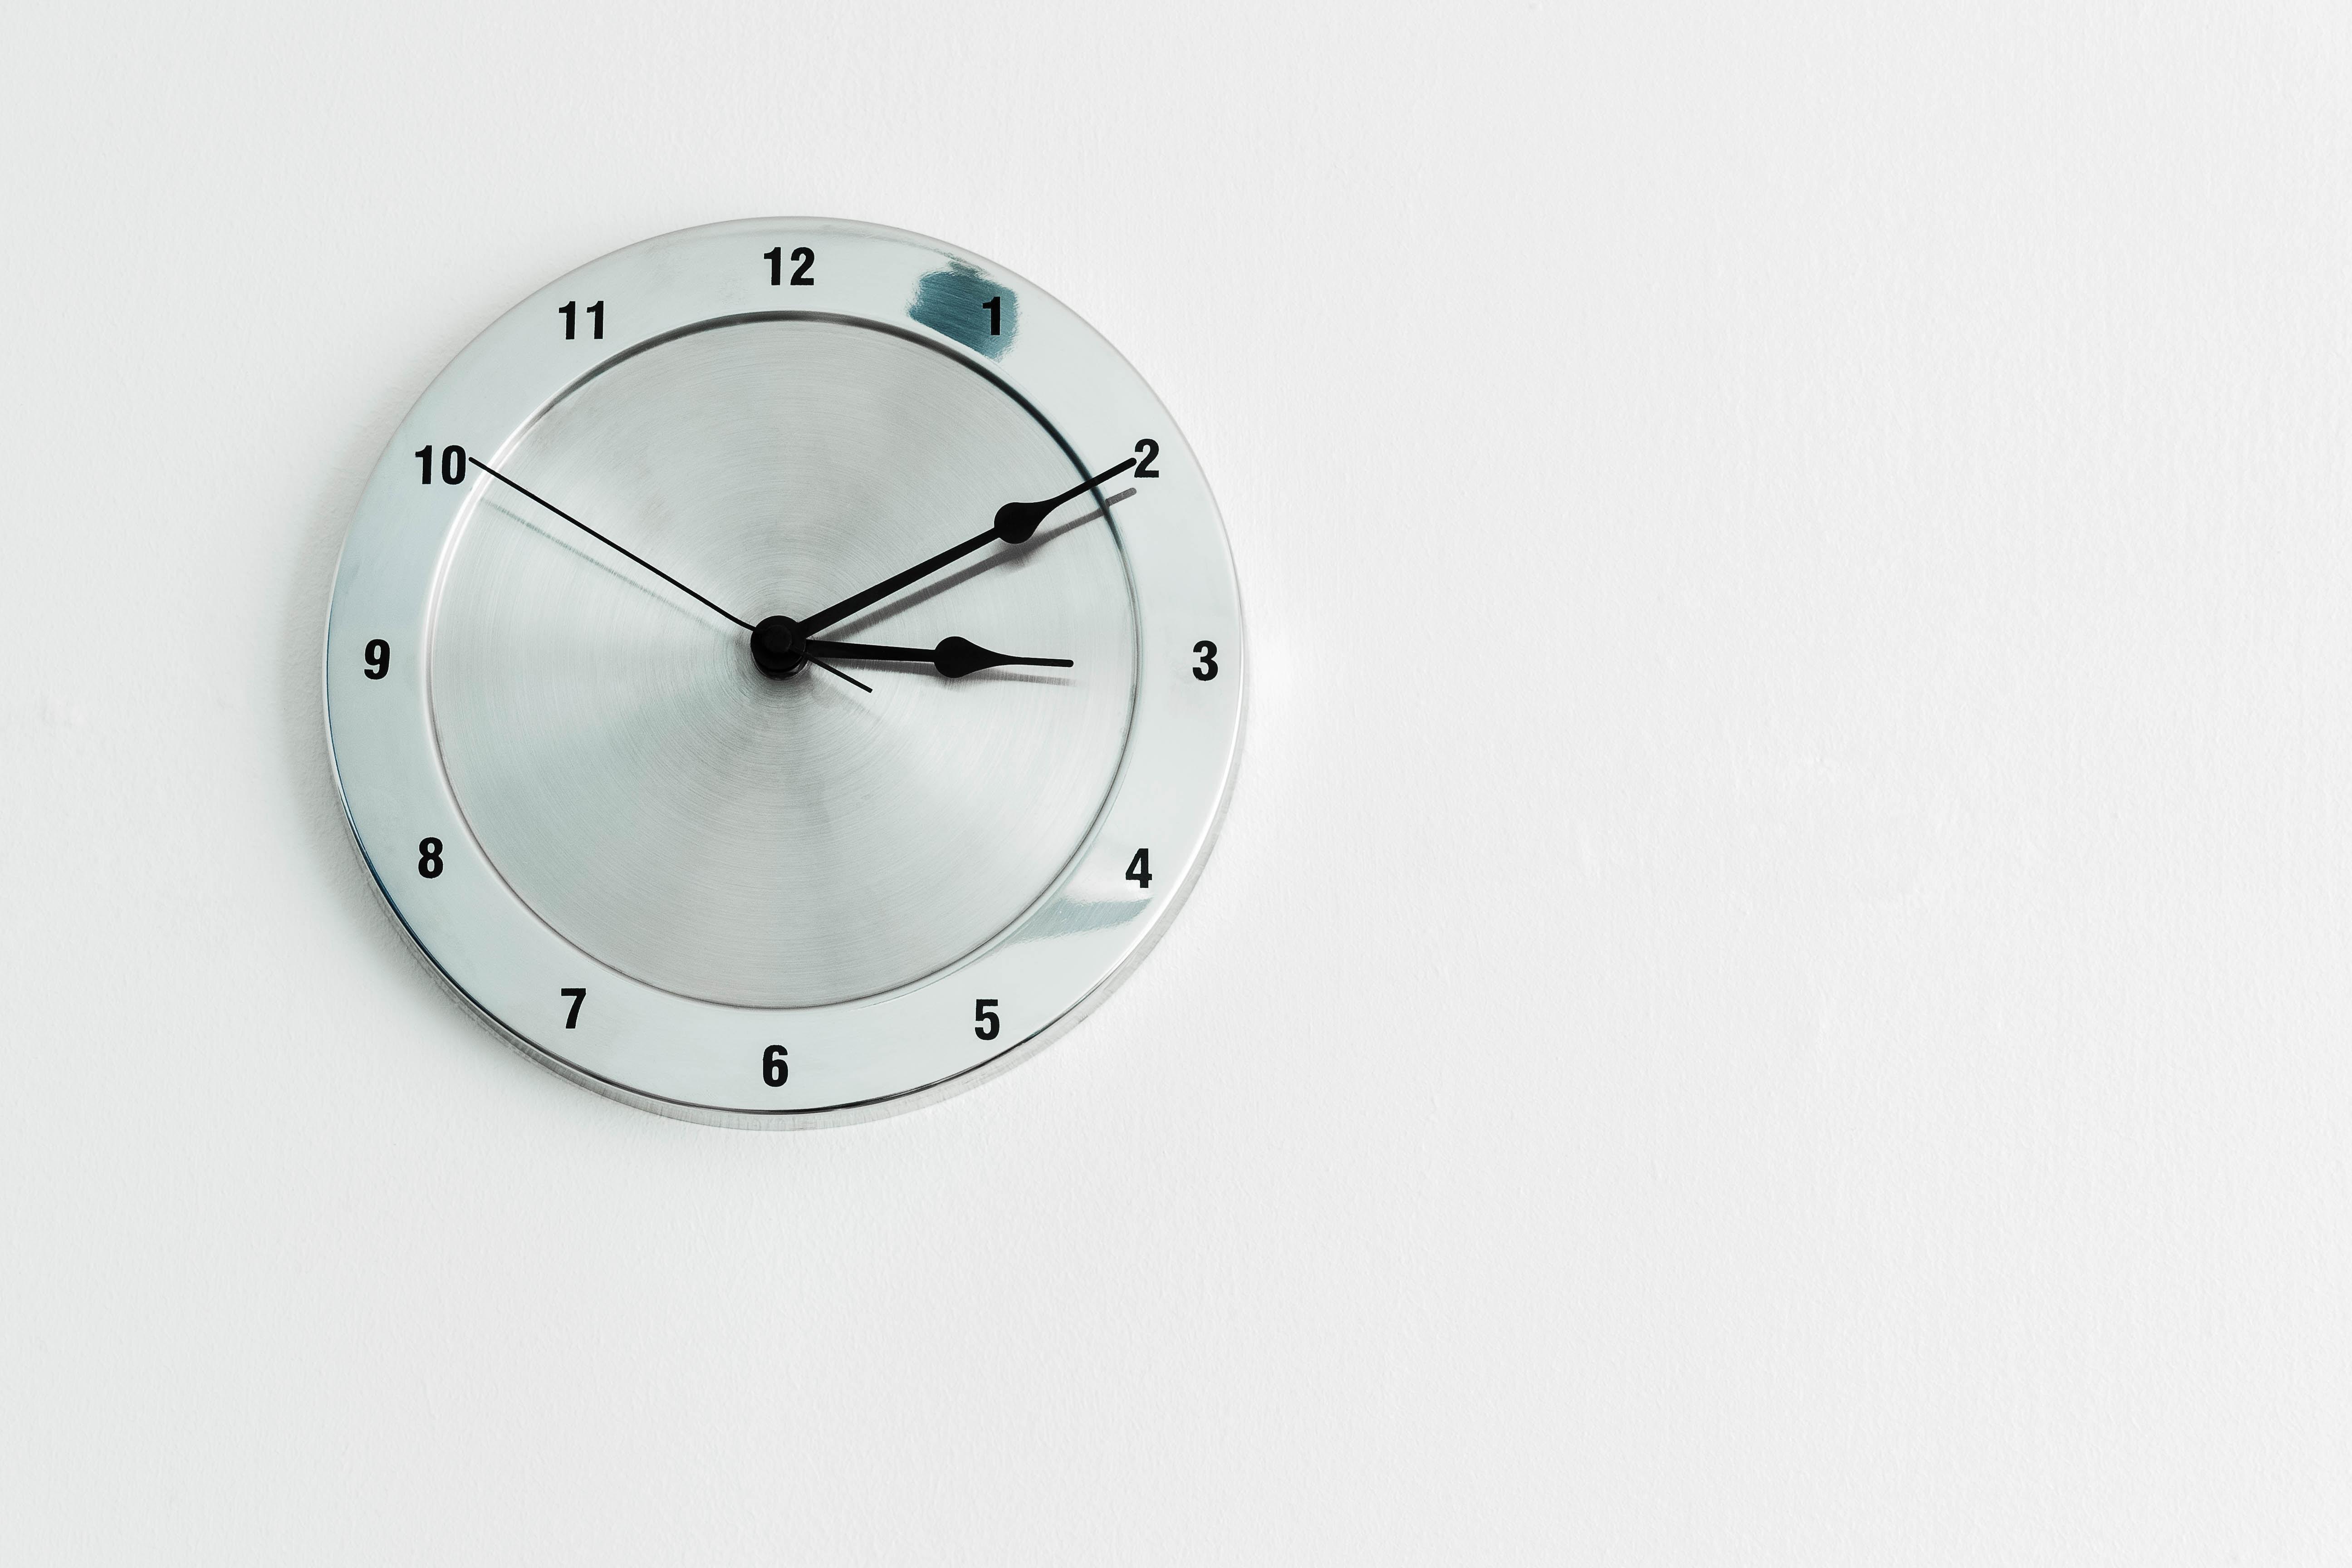 Créer une campagne AdWords et Bing Ads en 20 minutes top chrono !